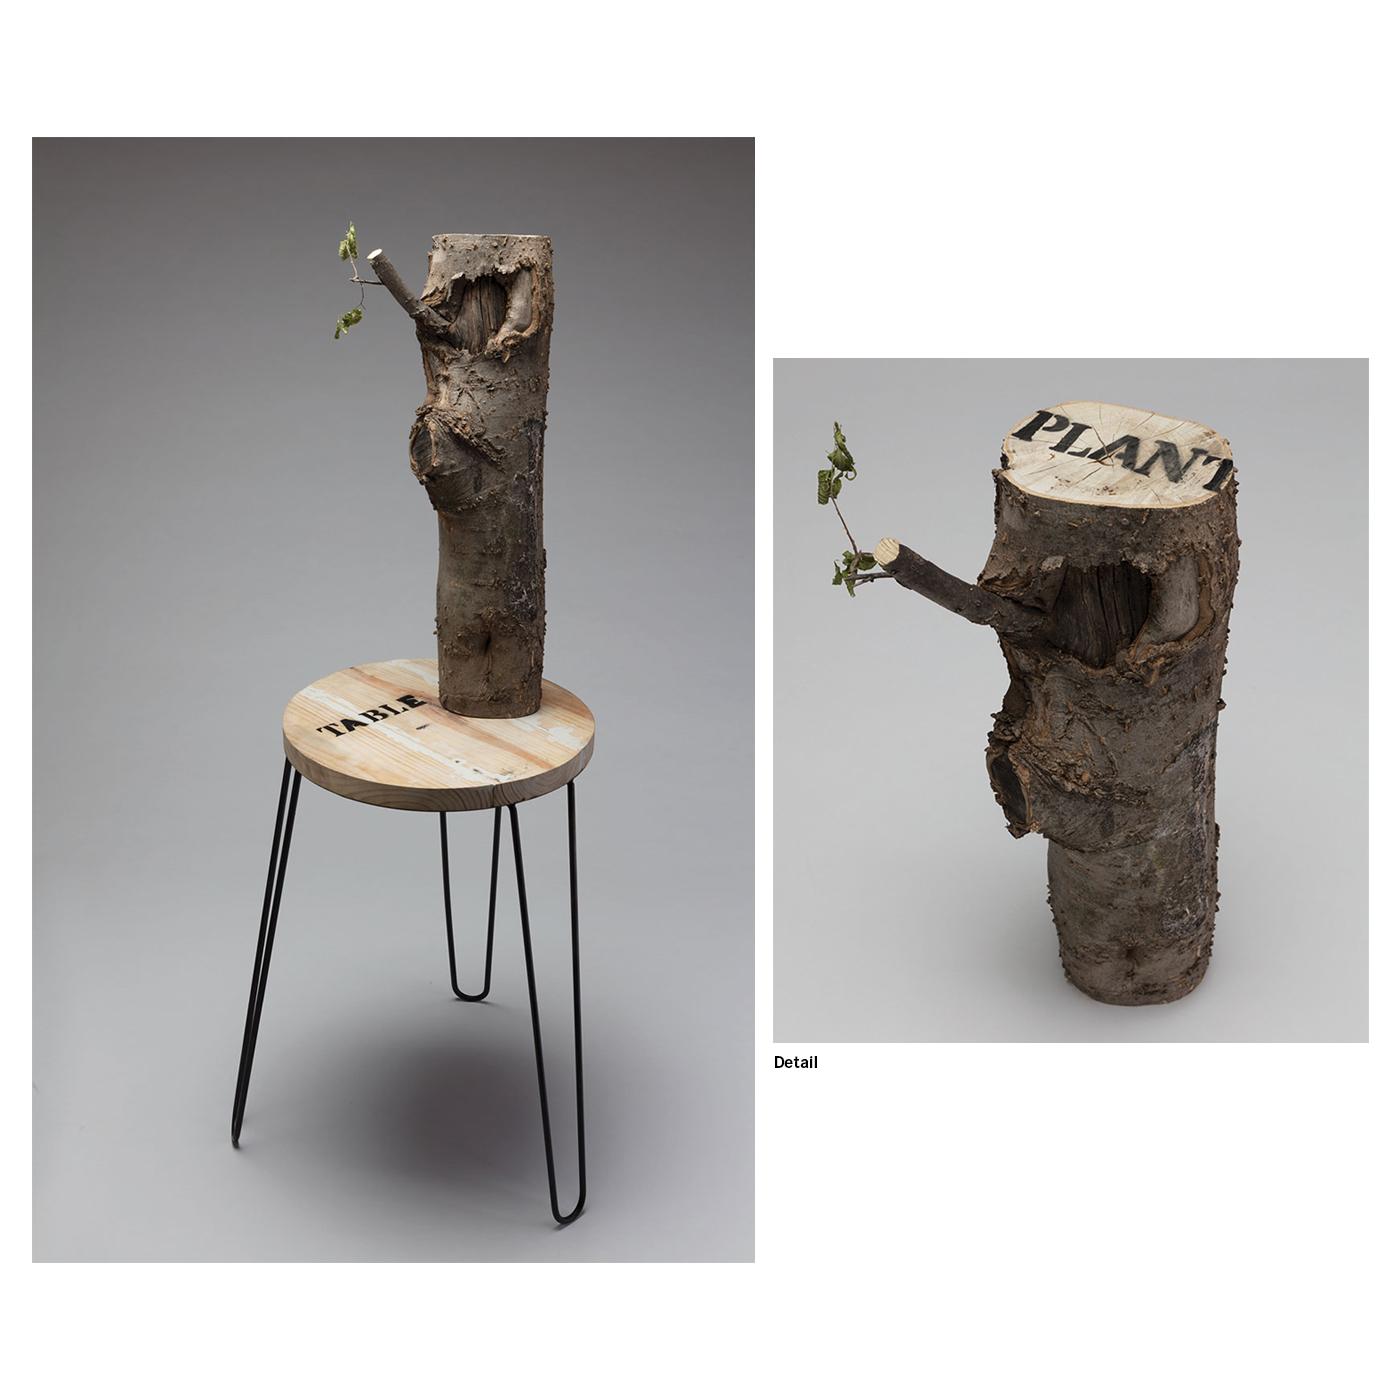 Luke Warren - Table and Plant